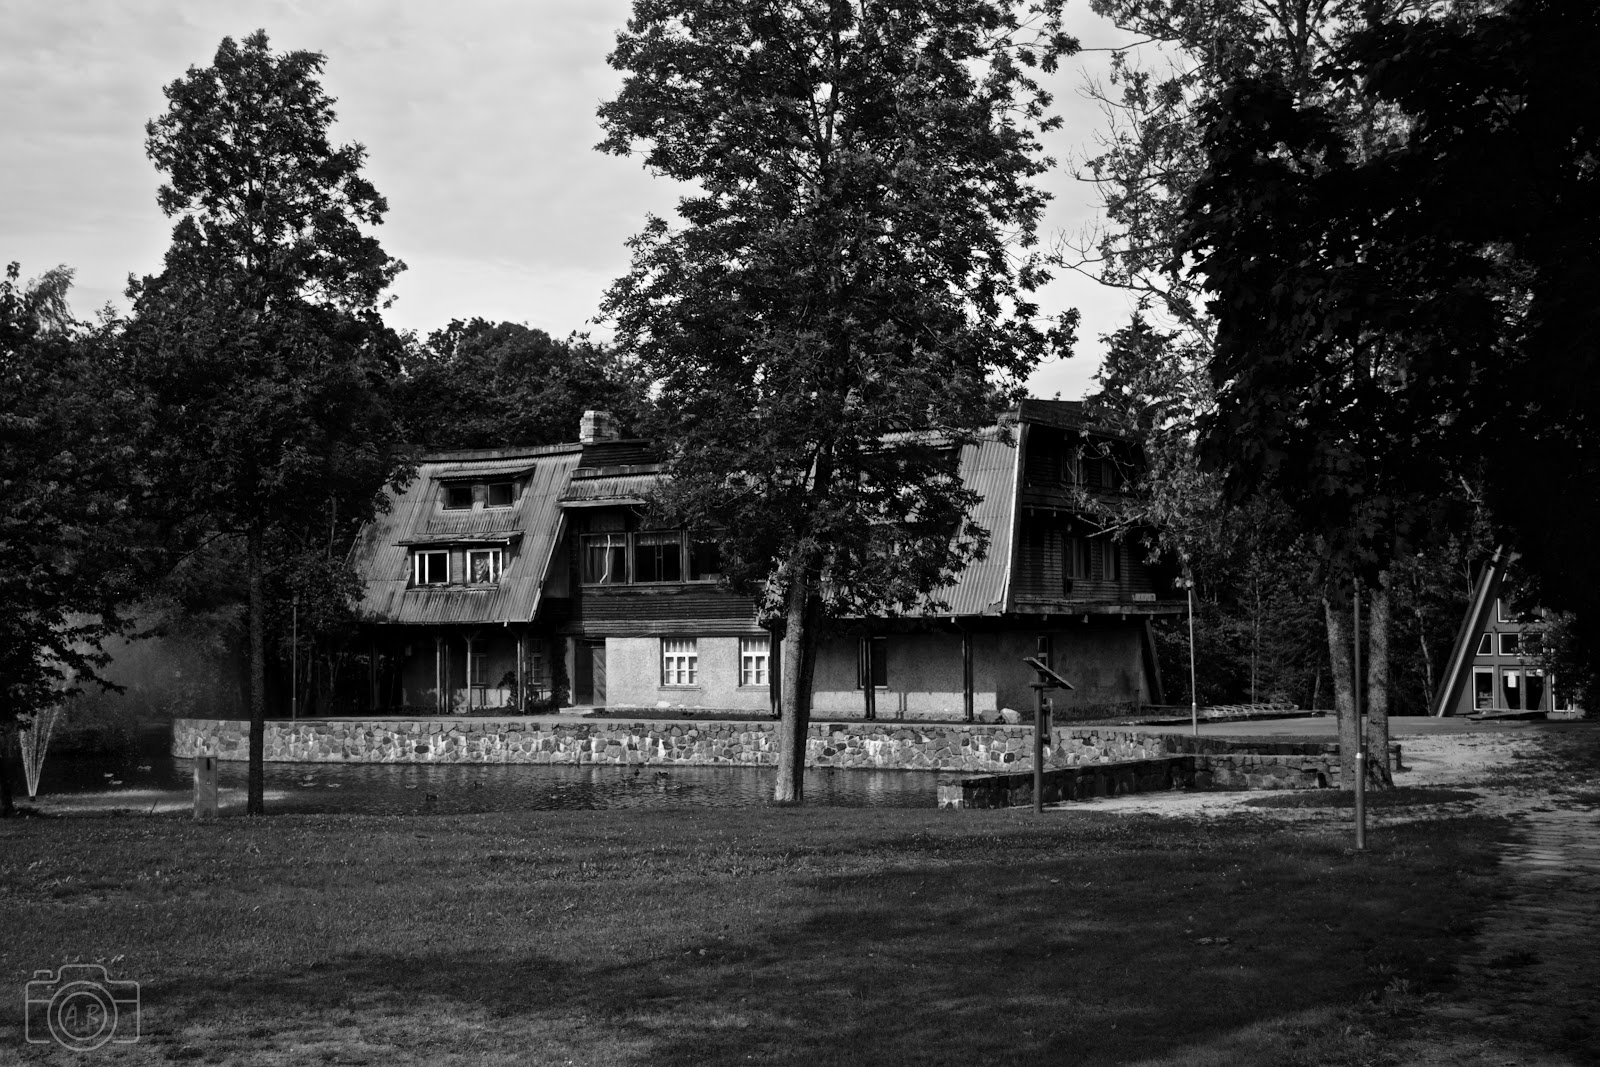 Sigulda photographie carnet voyage Nikon D3100 B&W noir et blanc black and white